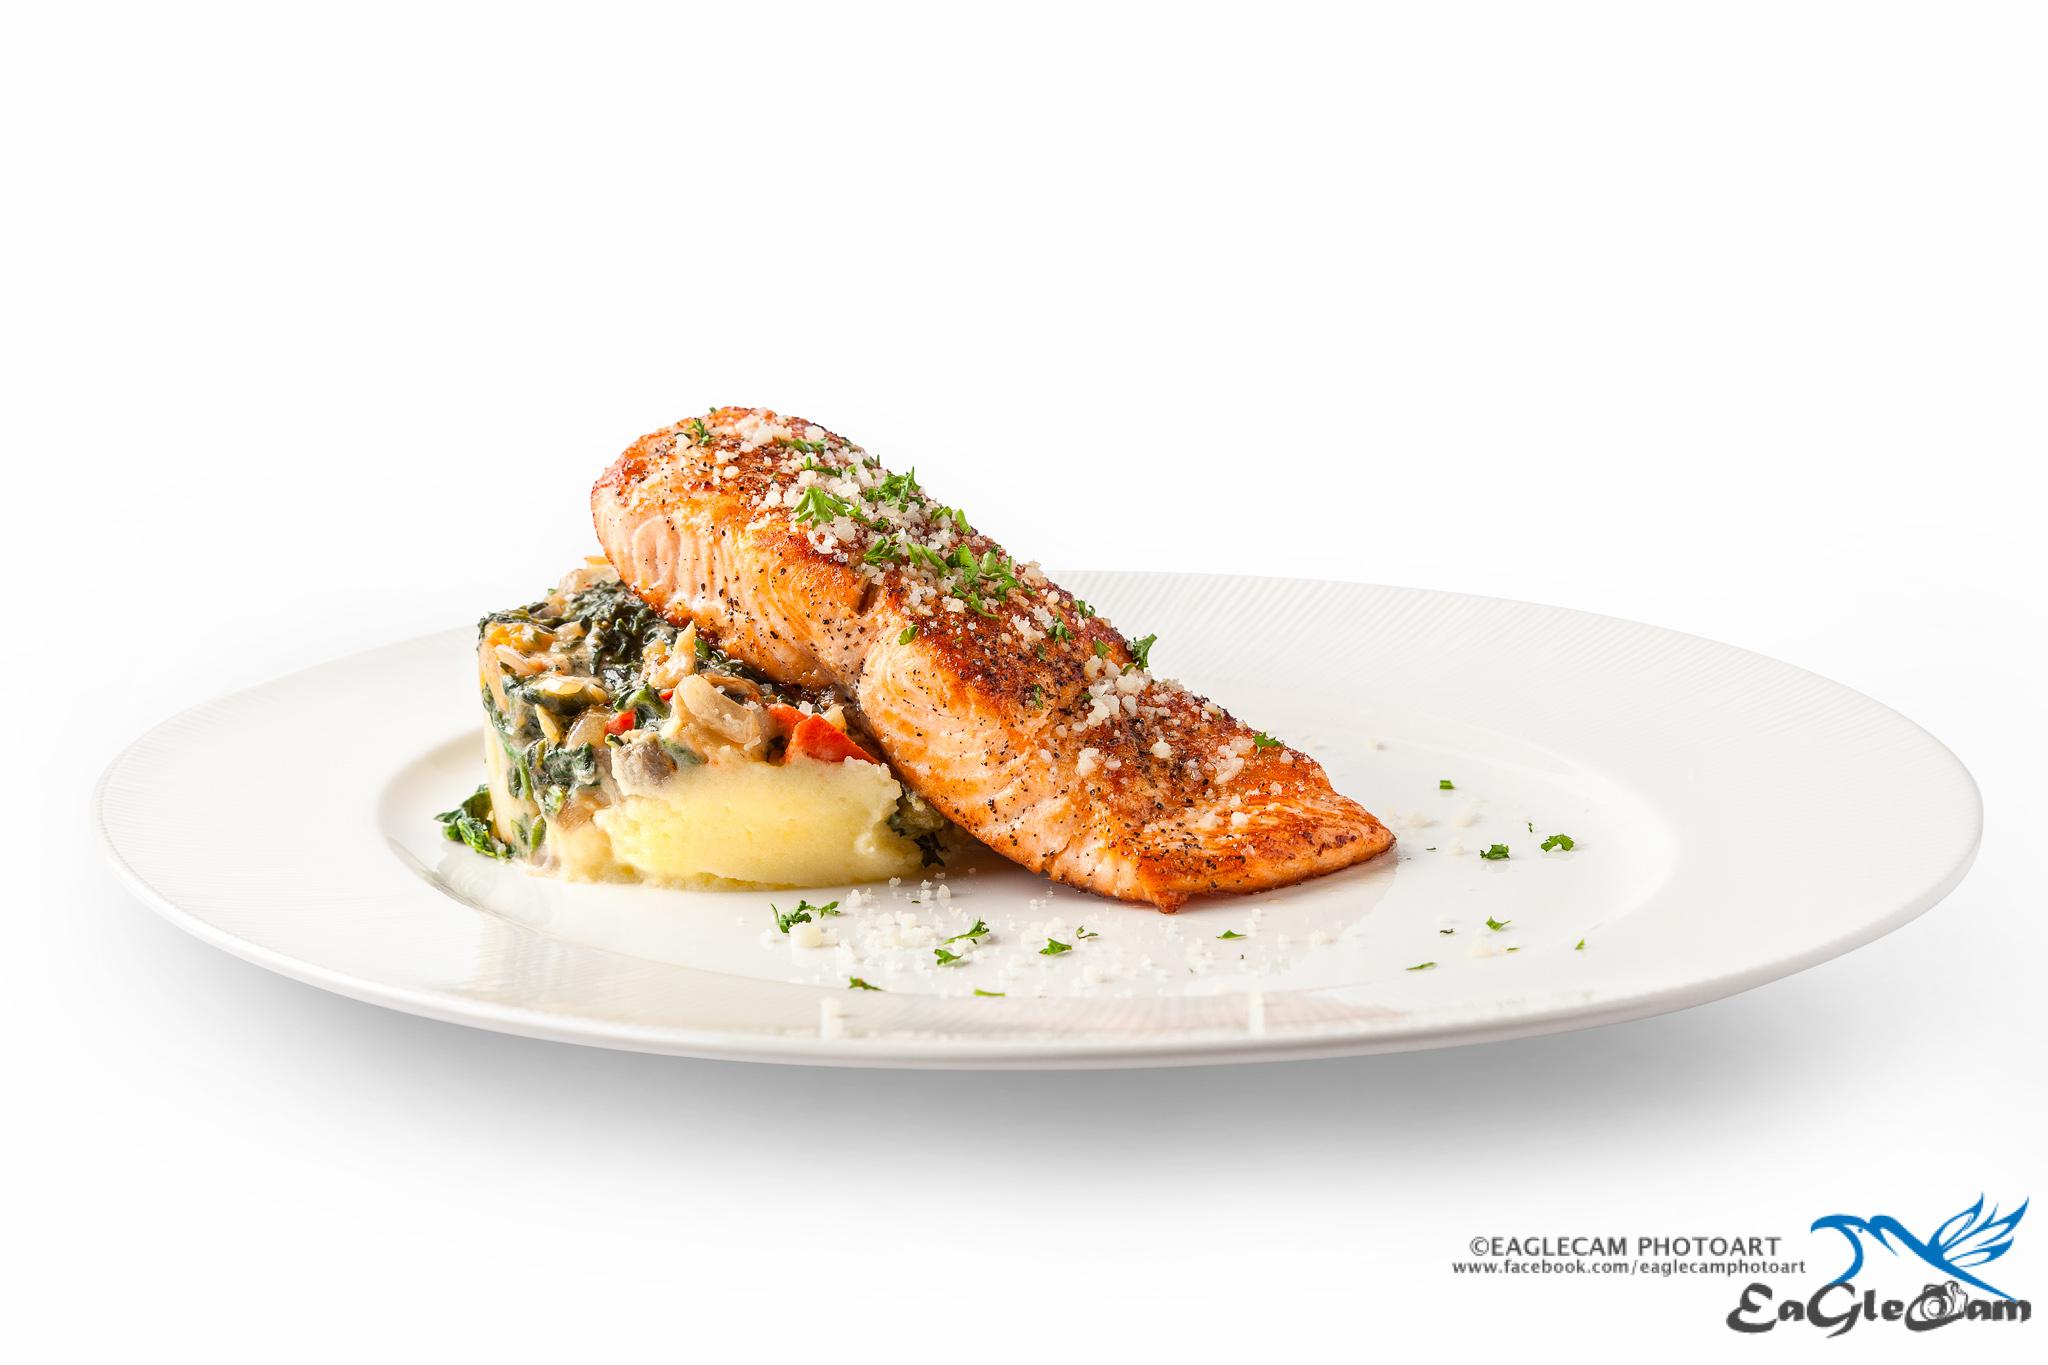 Food Photography #58